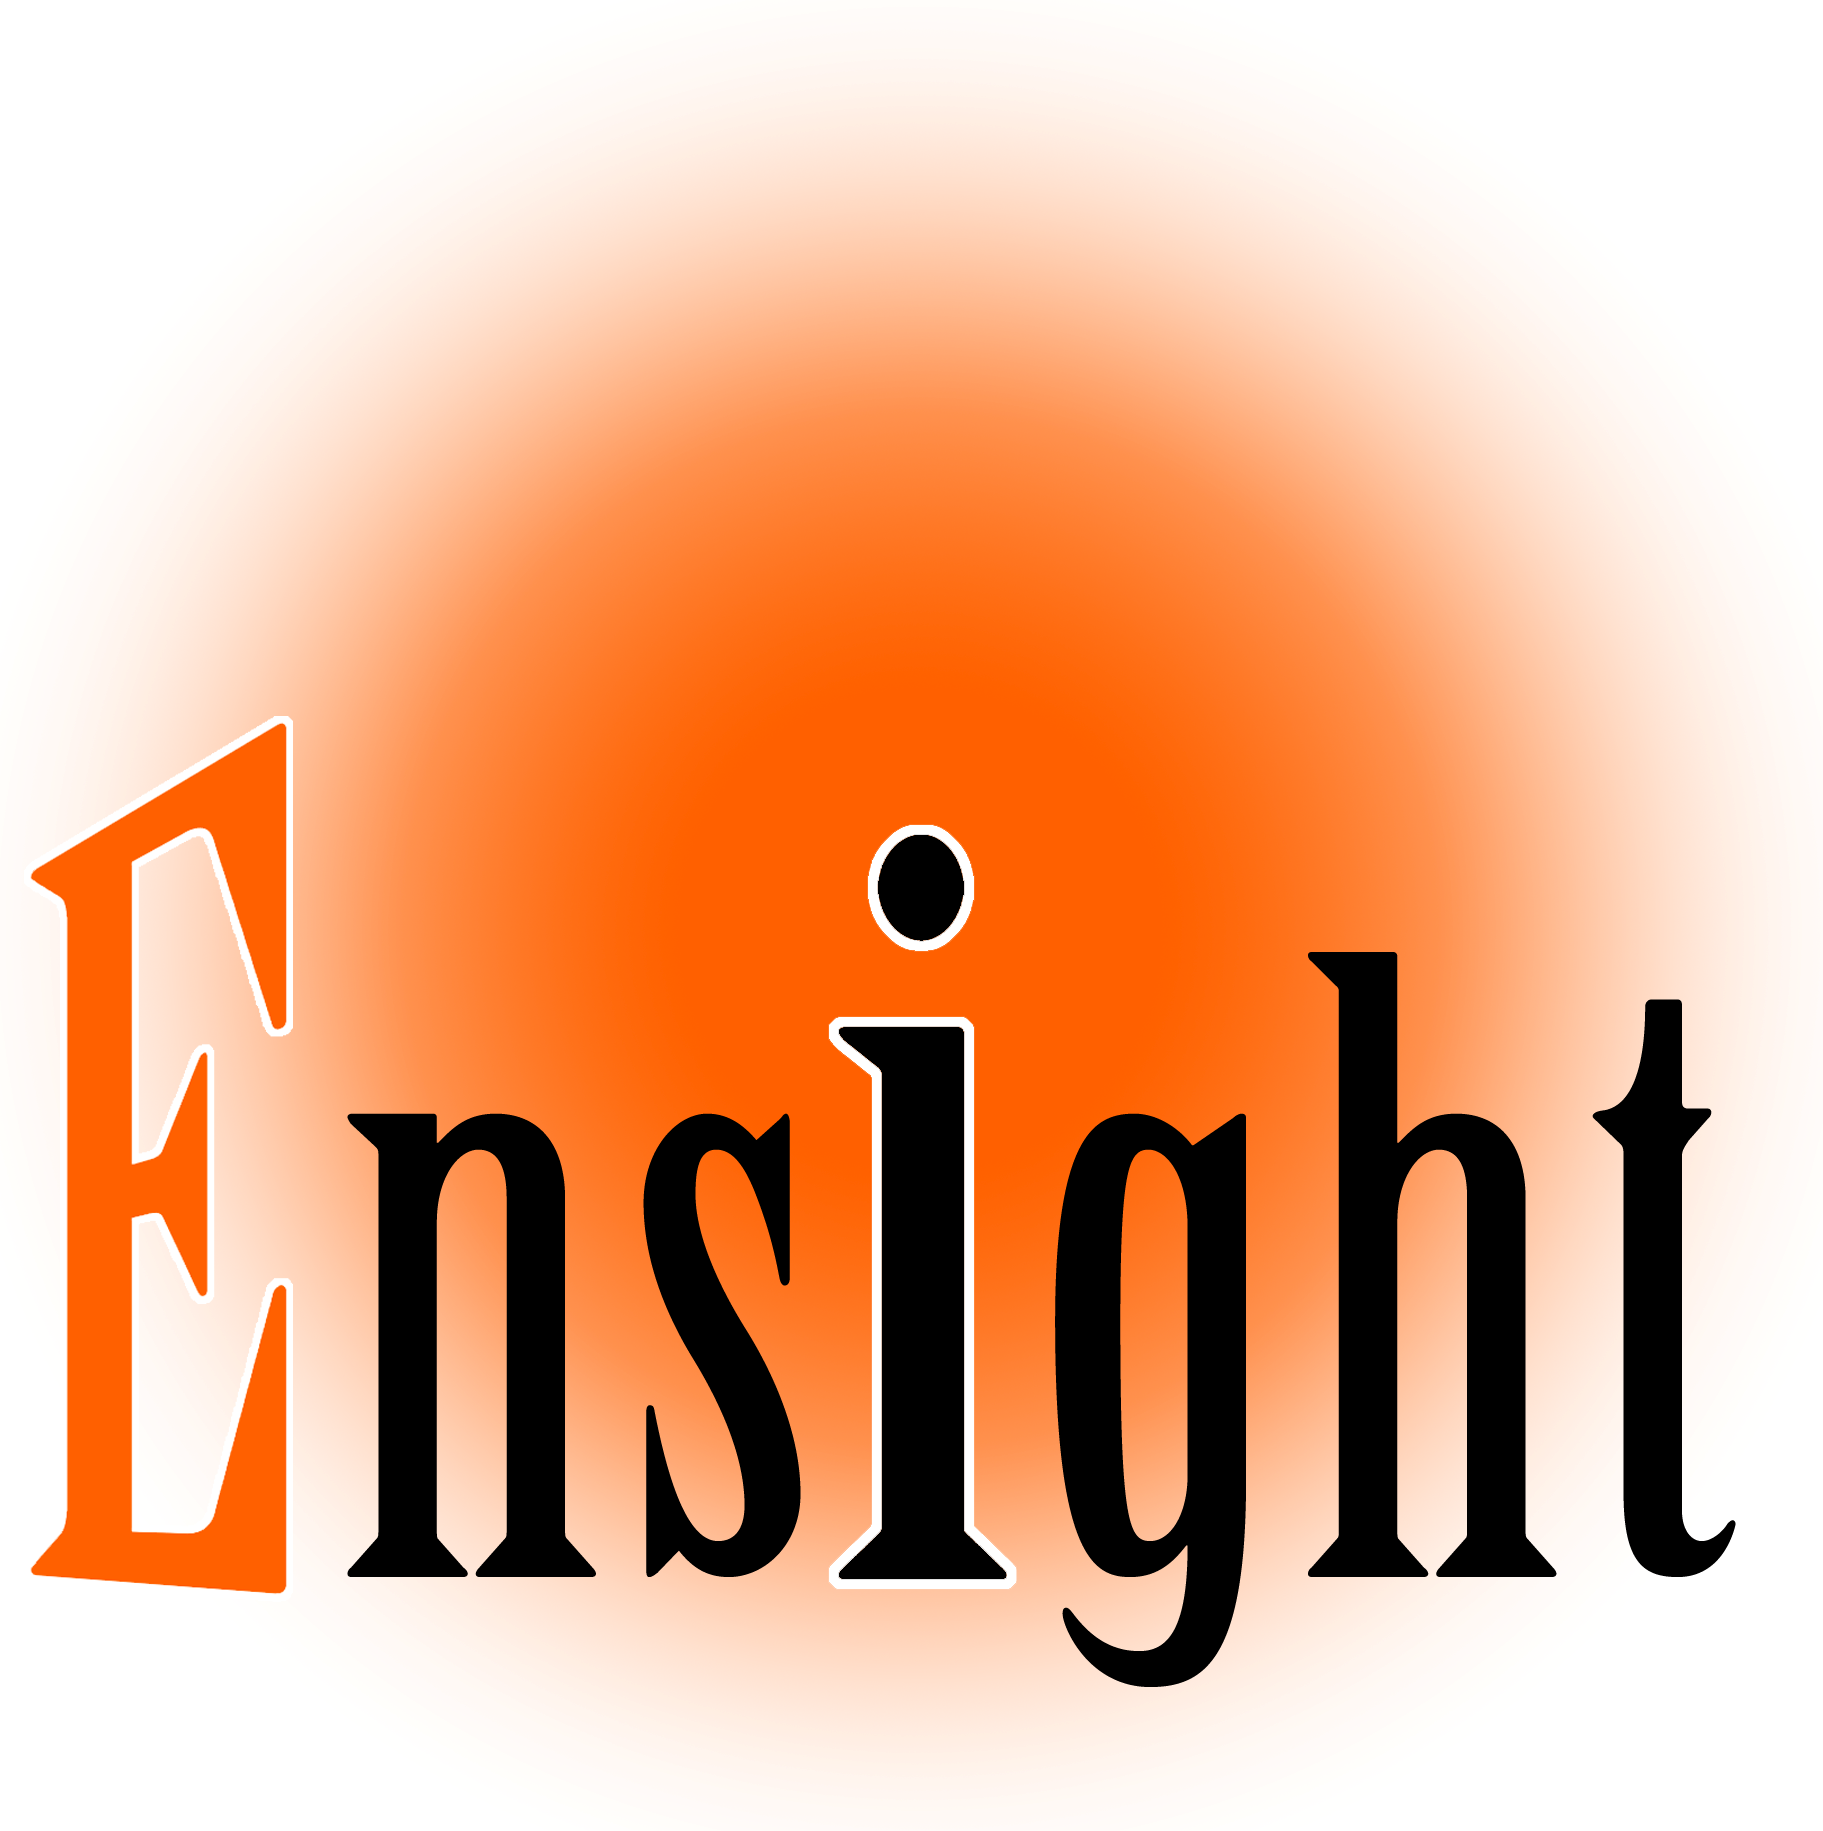 EnsightLogo.png